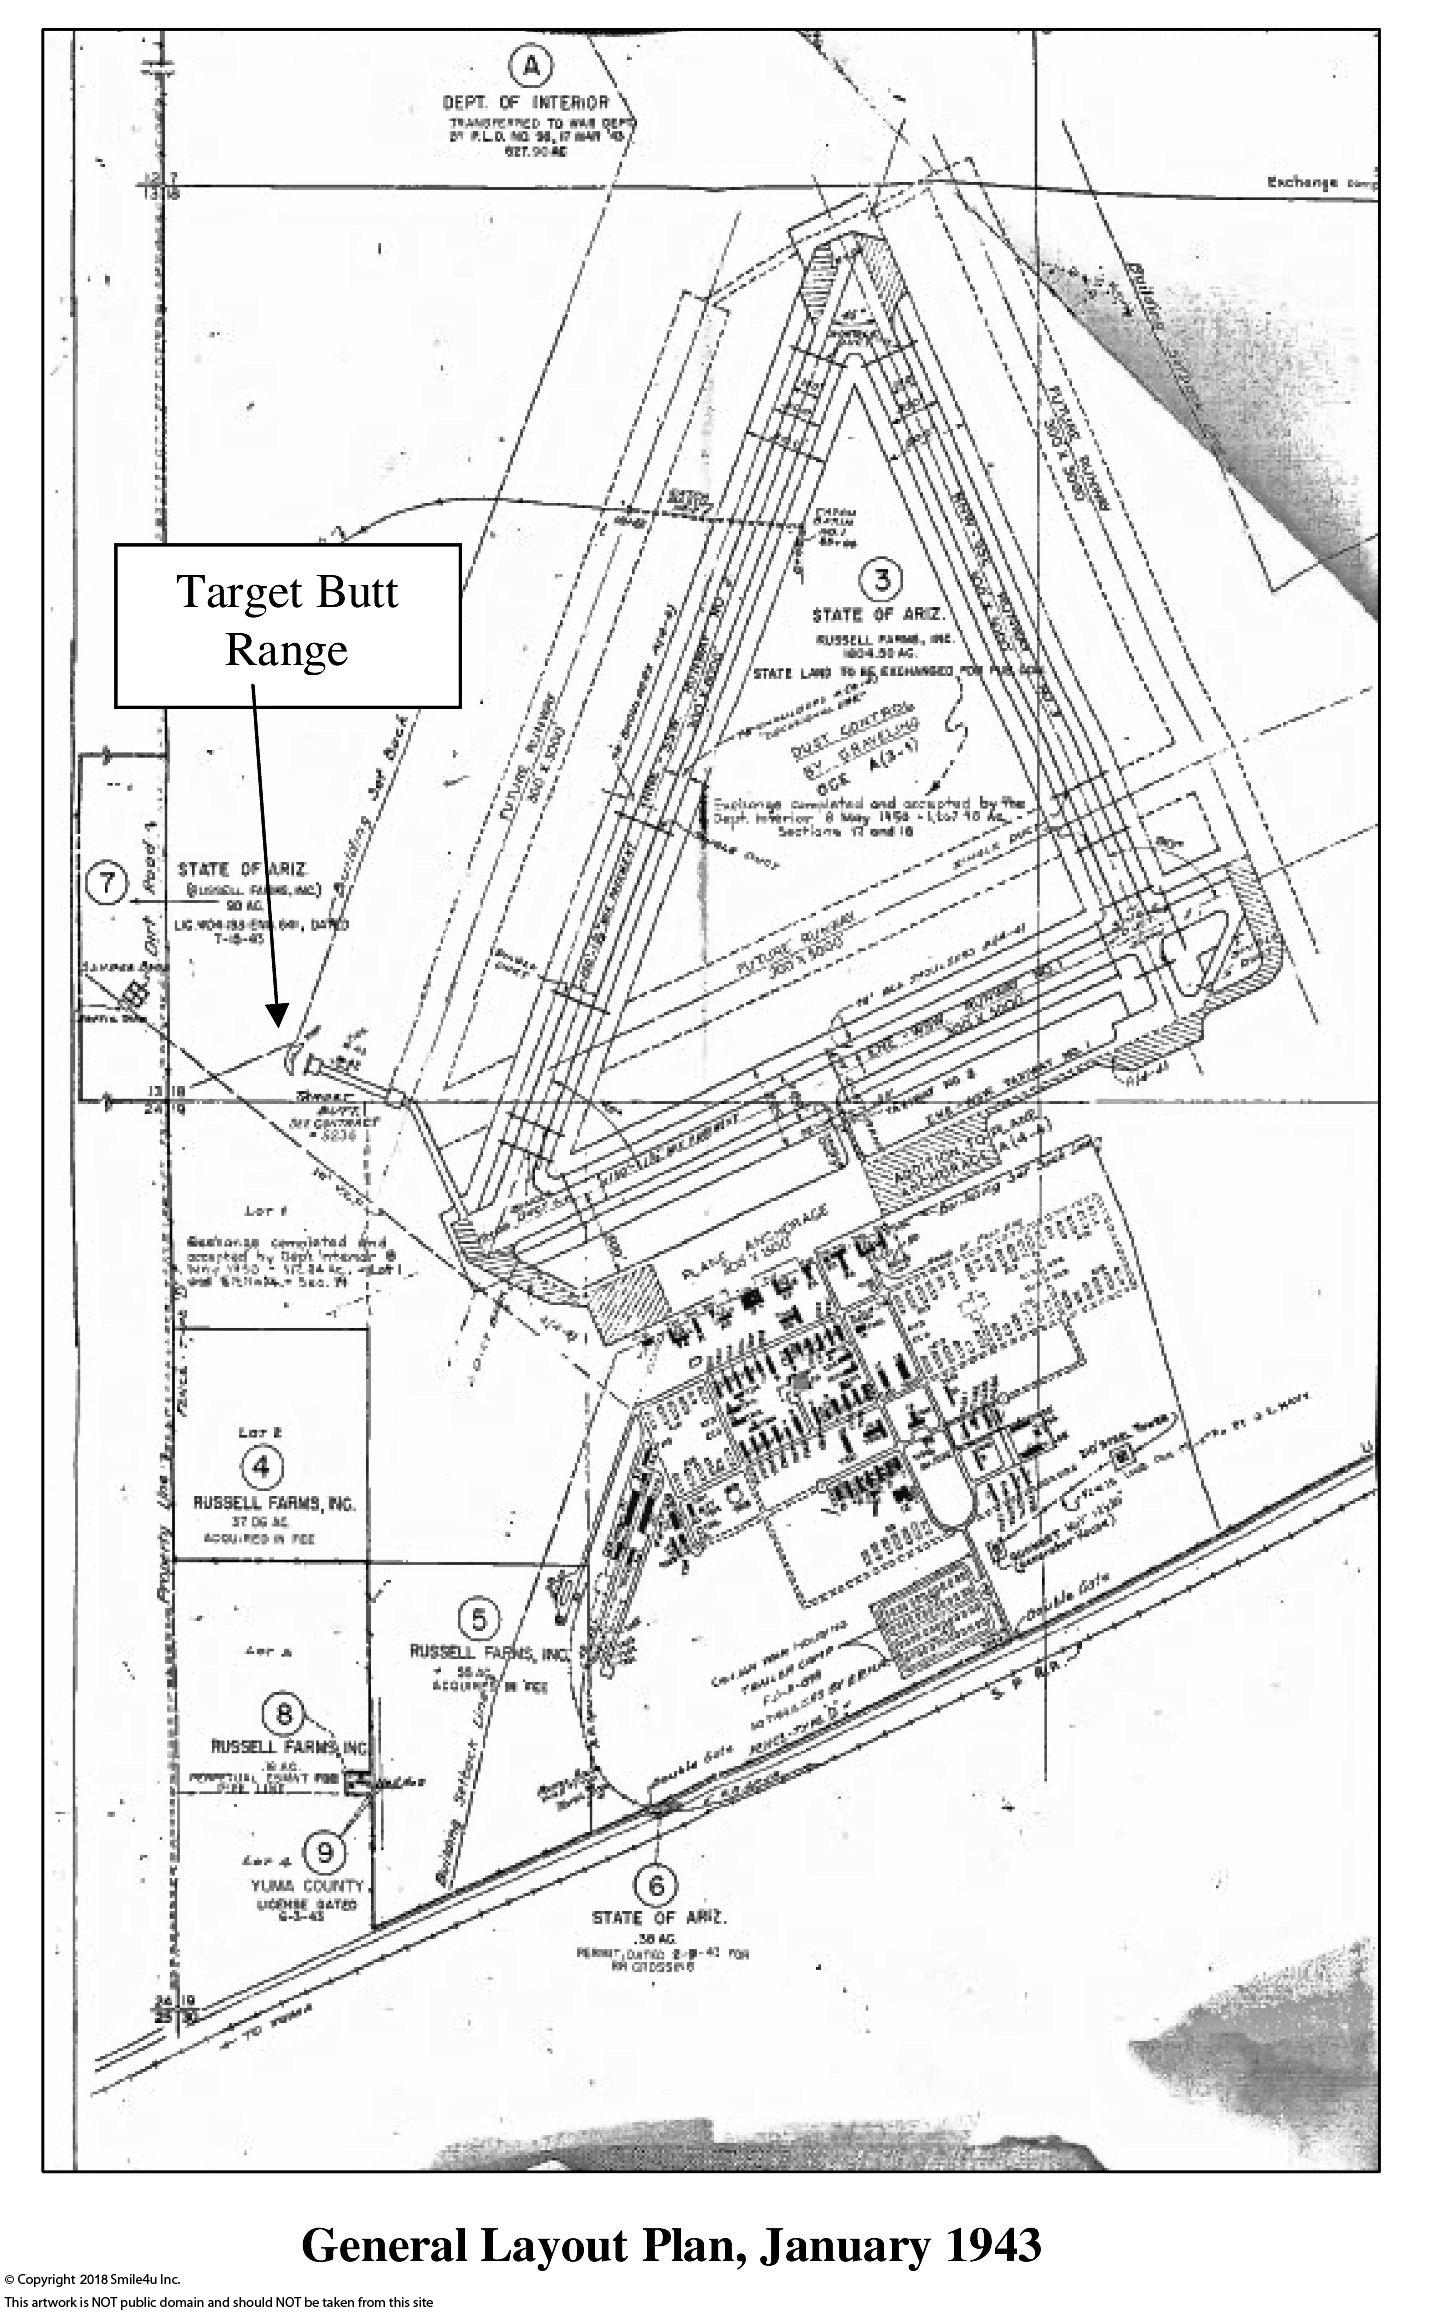 238013_watermarked_Dateland_AAF_general_layout_plan_jan_1943.jpg